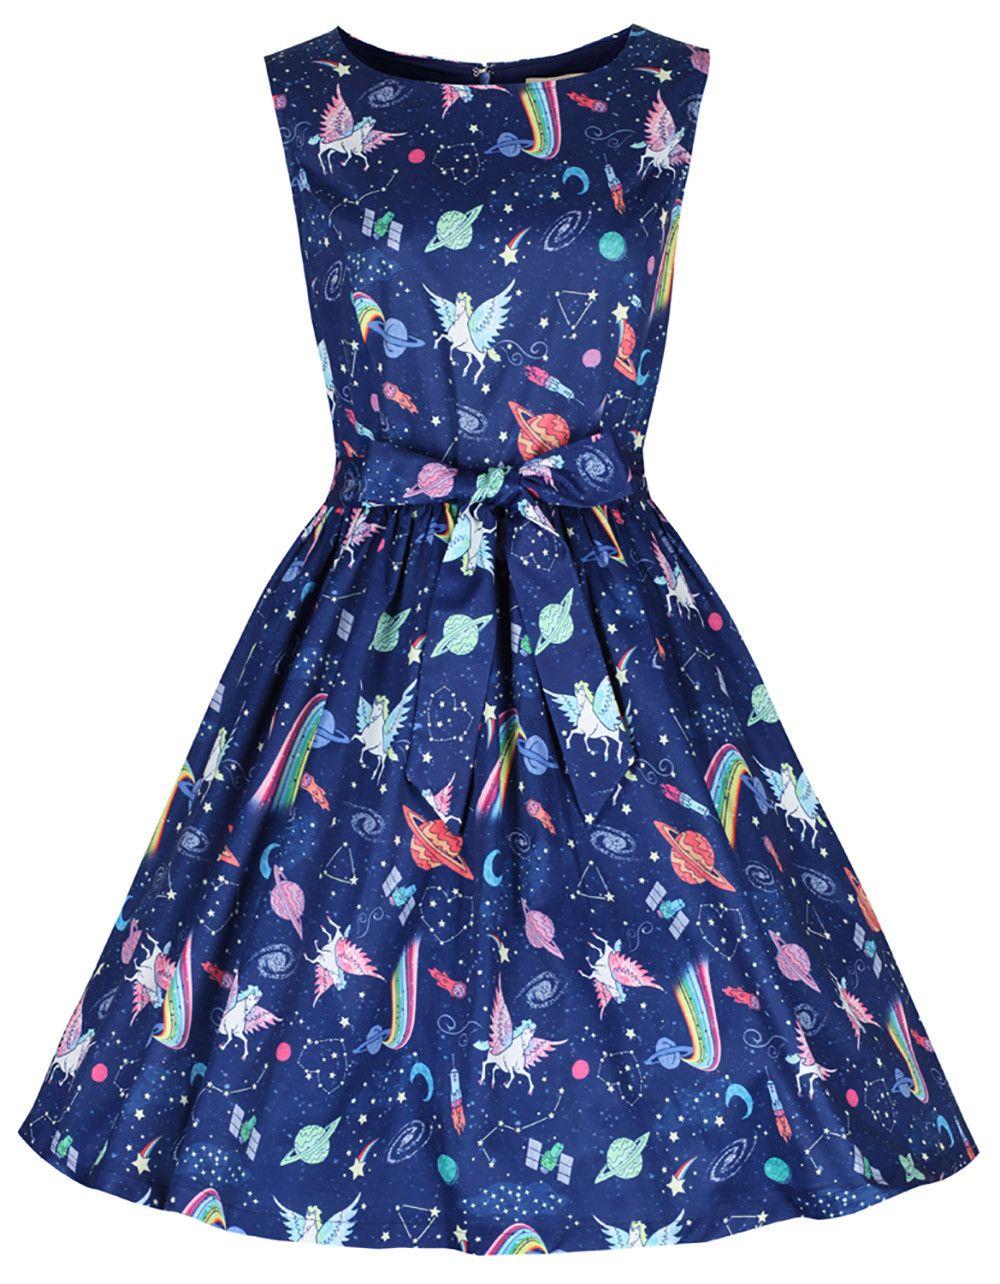 Blues swing cocktail dress